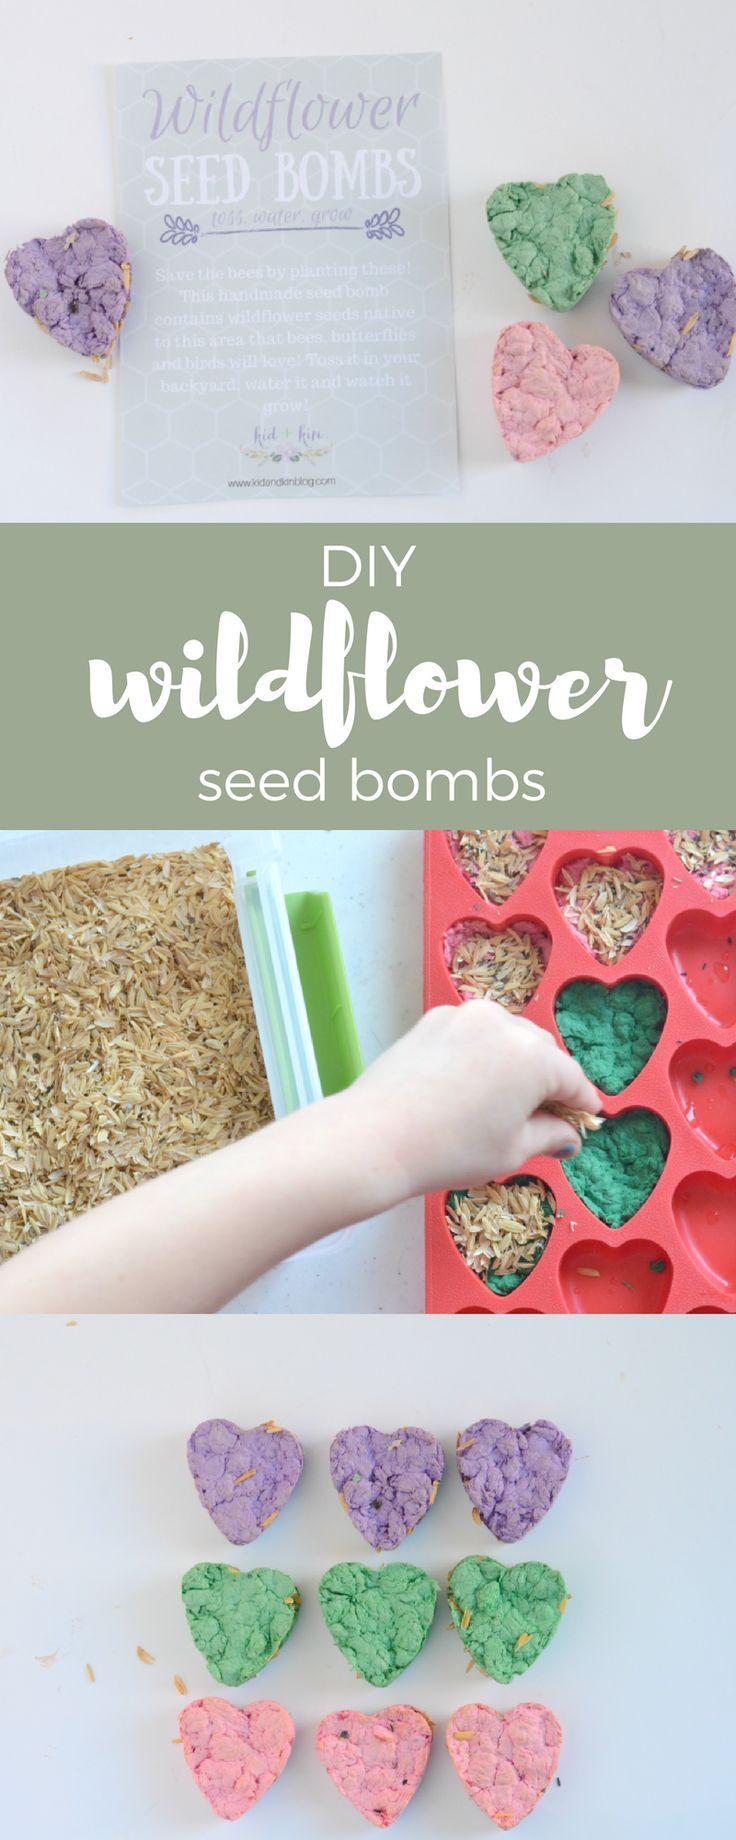 Kind Kids Club Diy Wildflower Seed Bombs Kid Kin